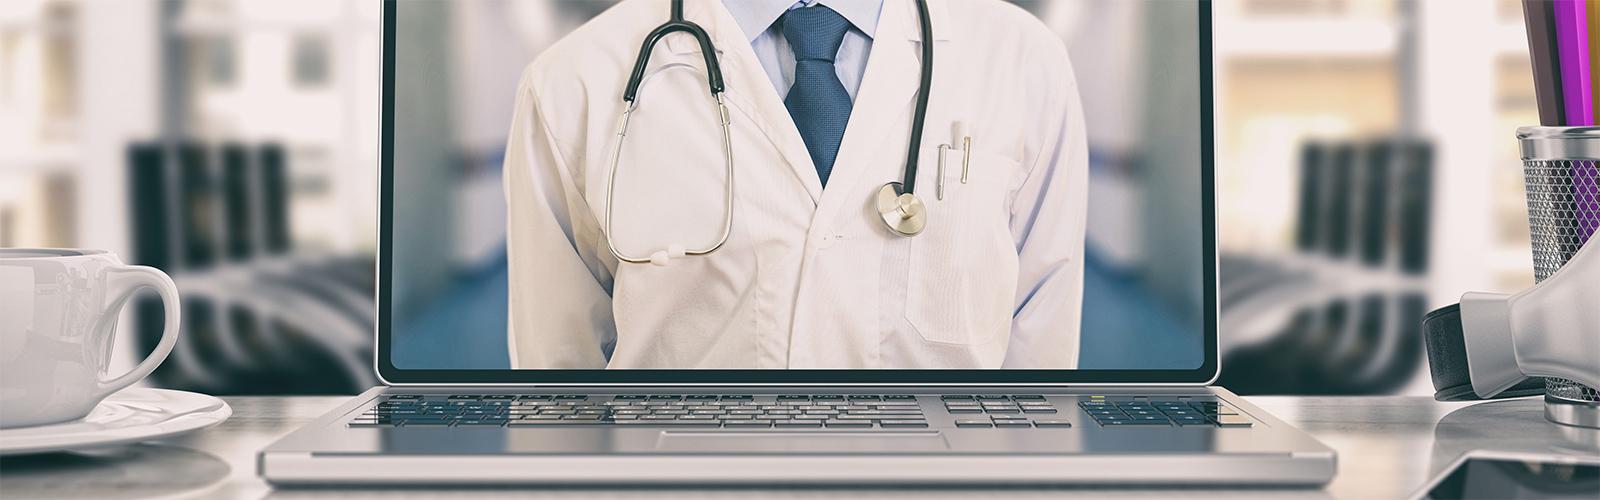 Telemedicine Appointment - Associates in Dermatology